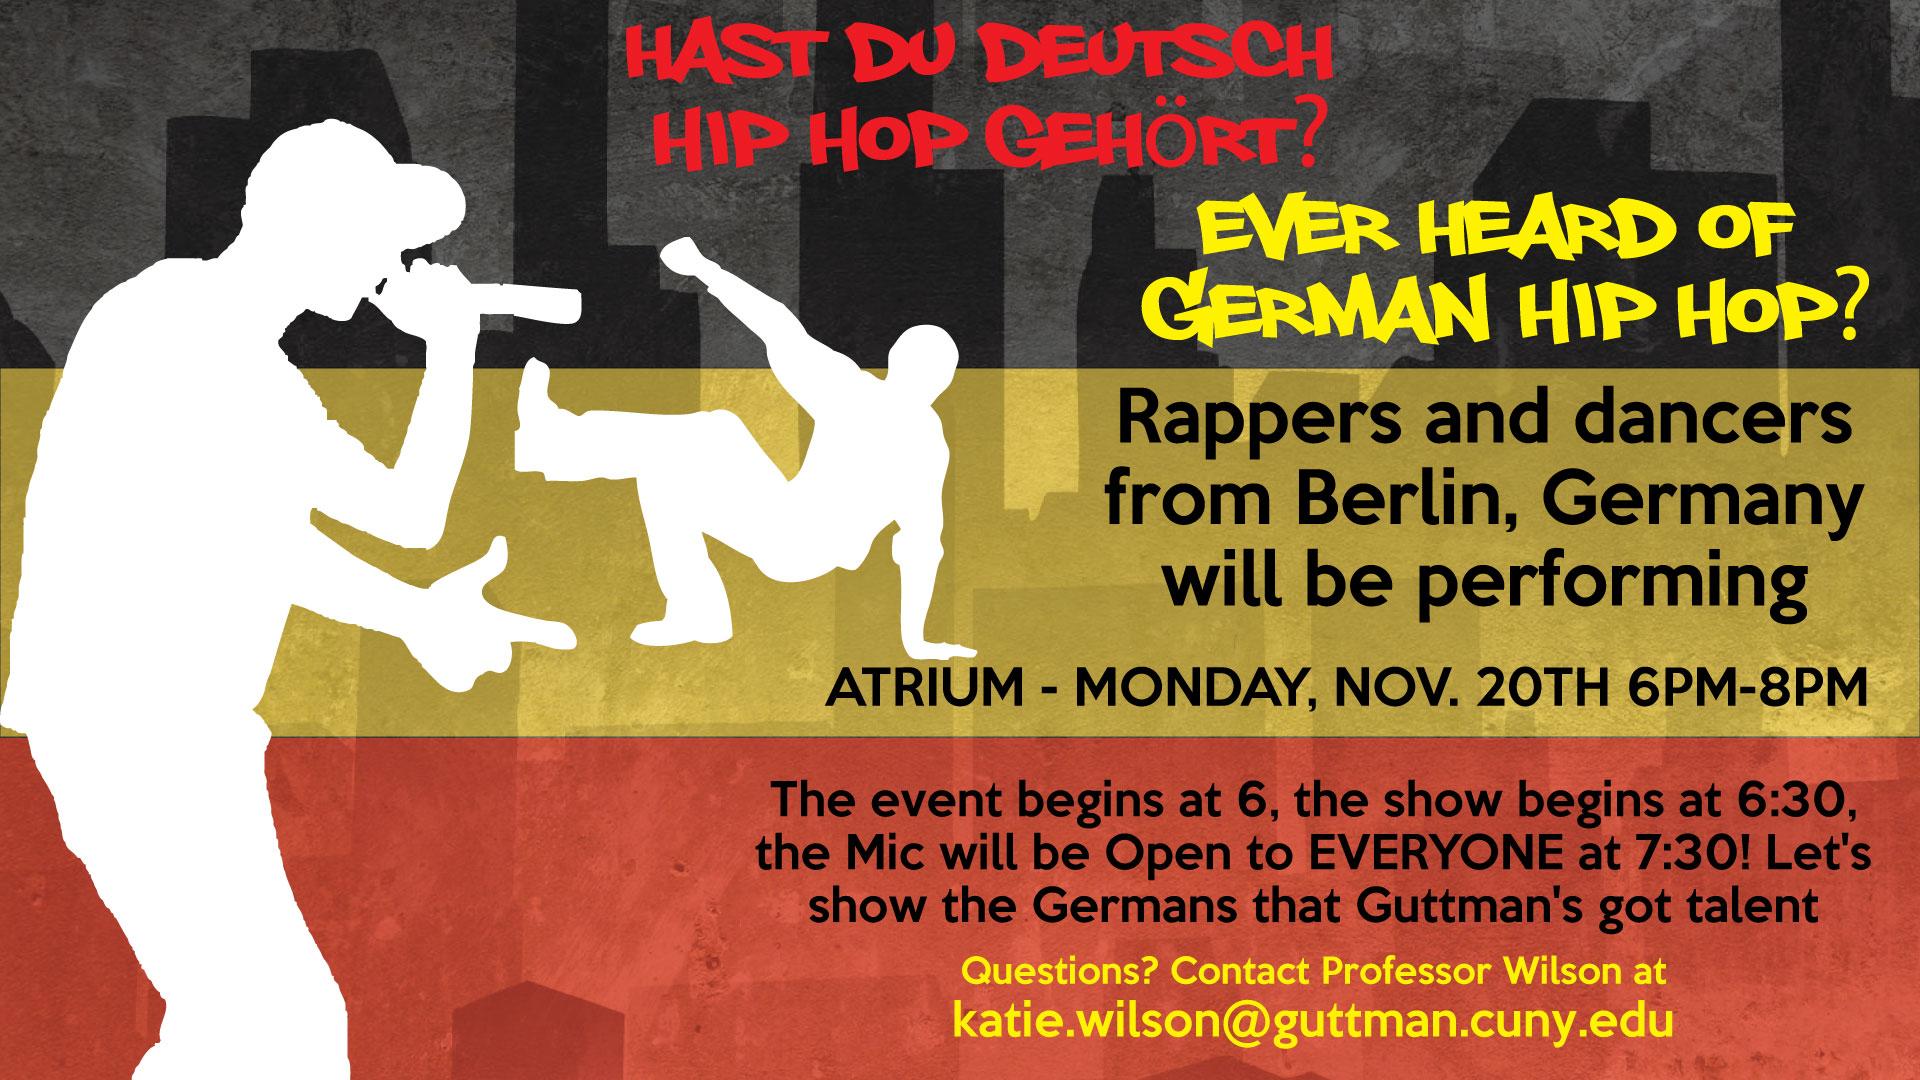 German Hip Hop Event